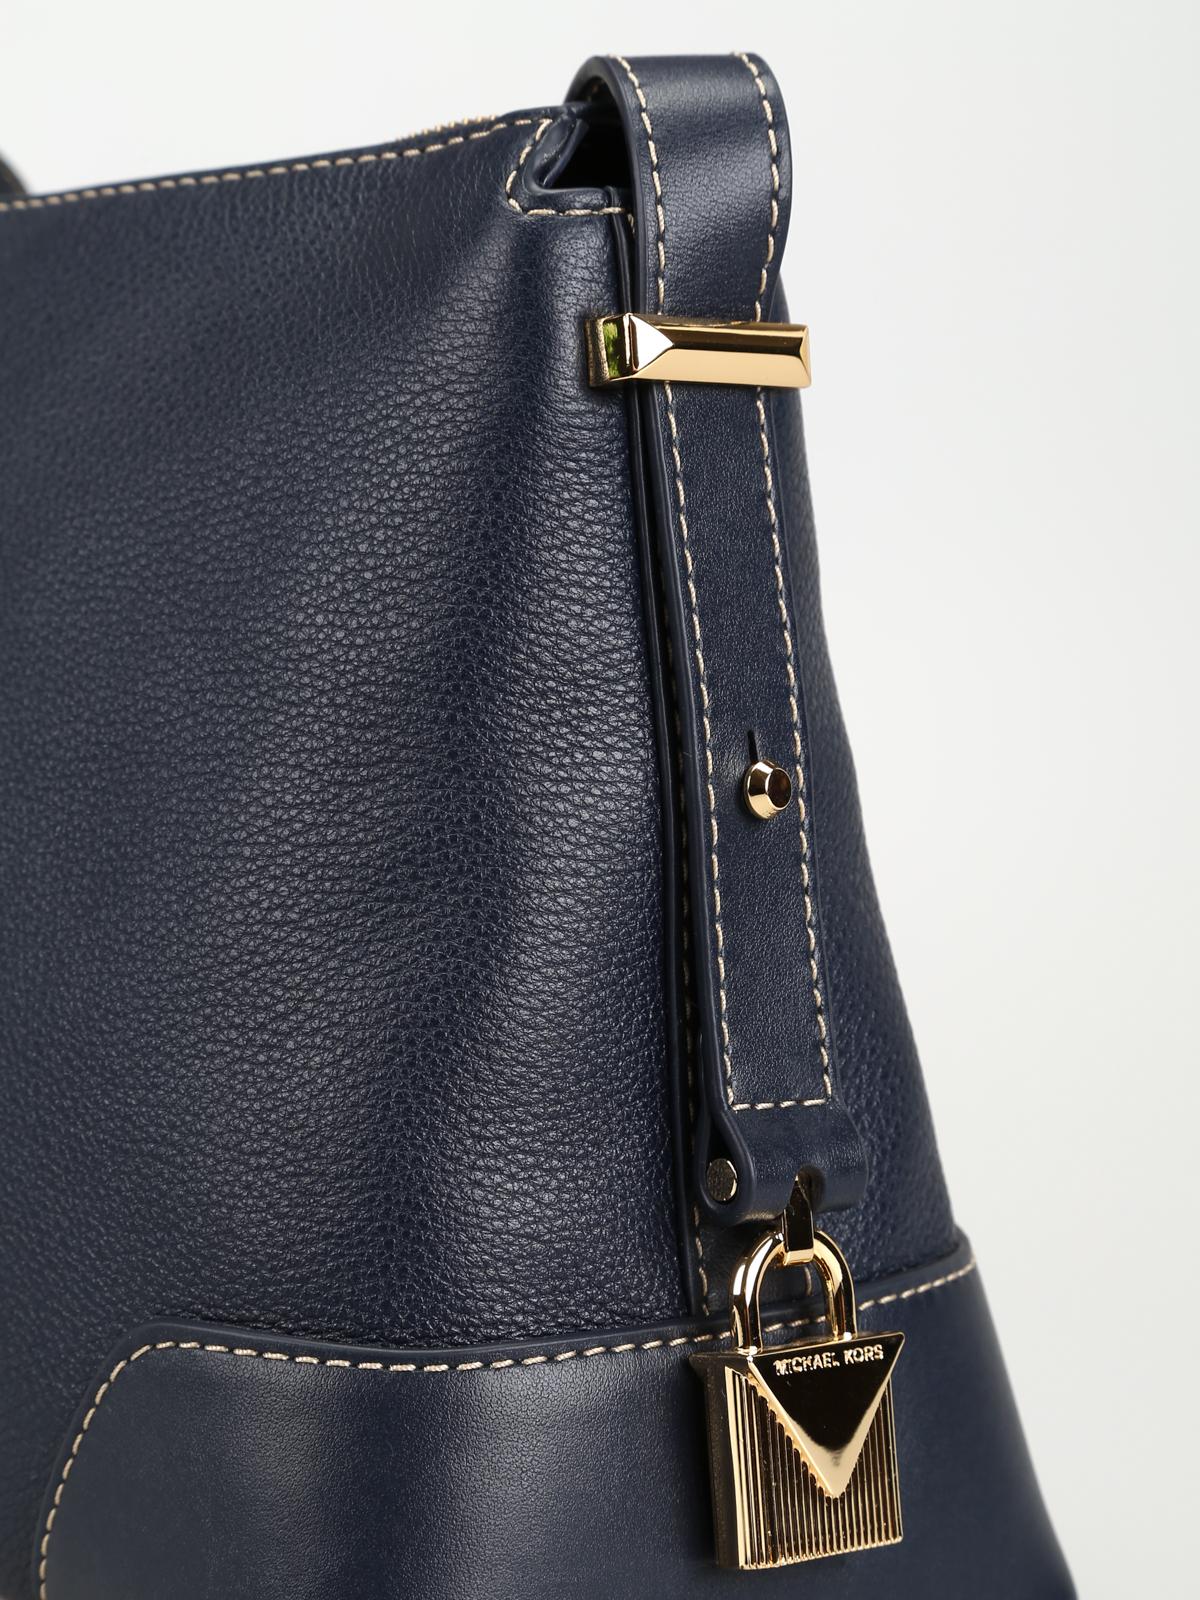 52aadde9fd3797 Michael Kors - Crosby admiral leather medium messenger bag - cross ...